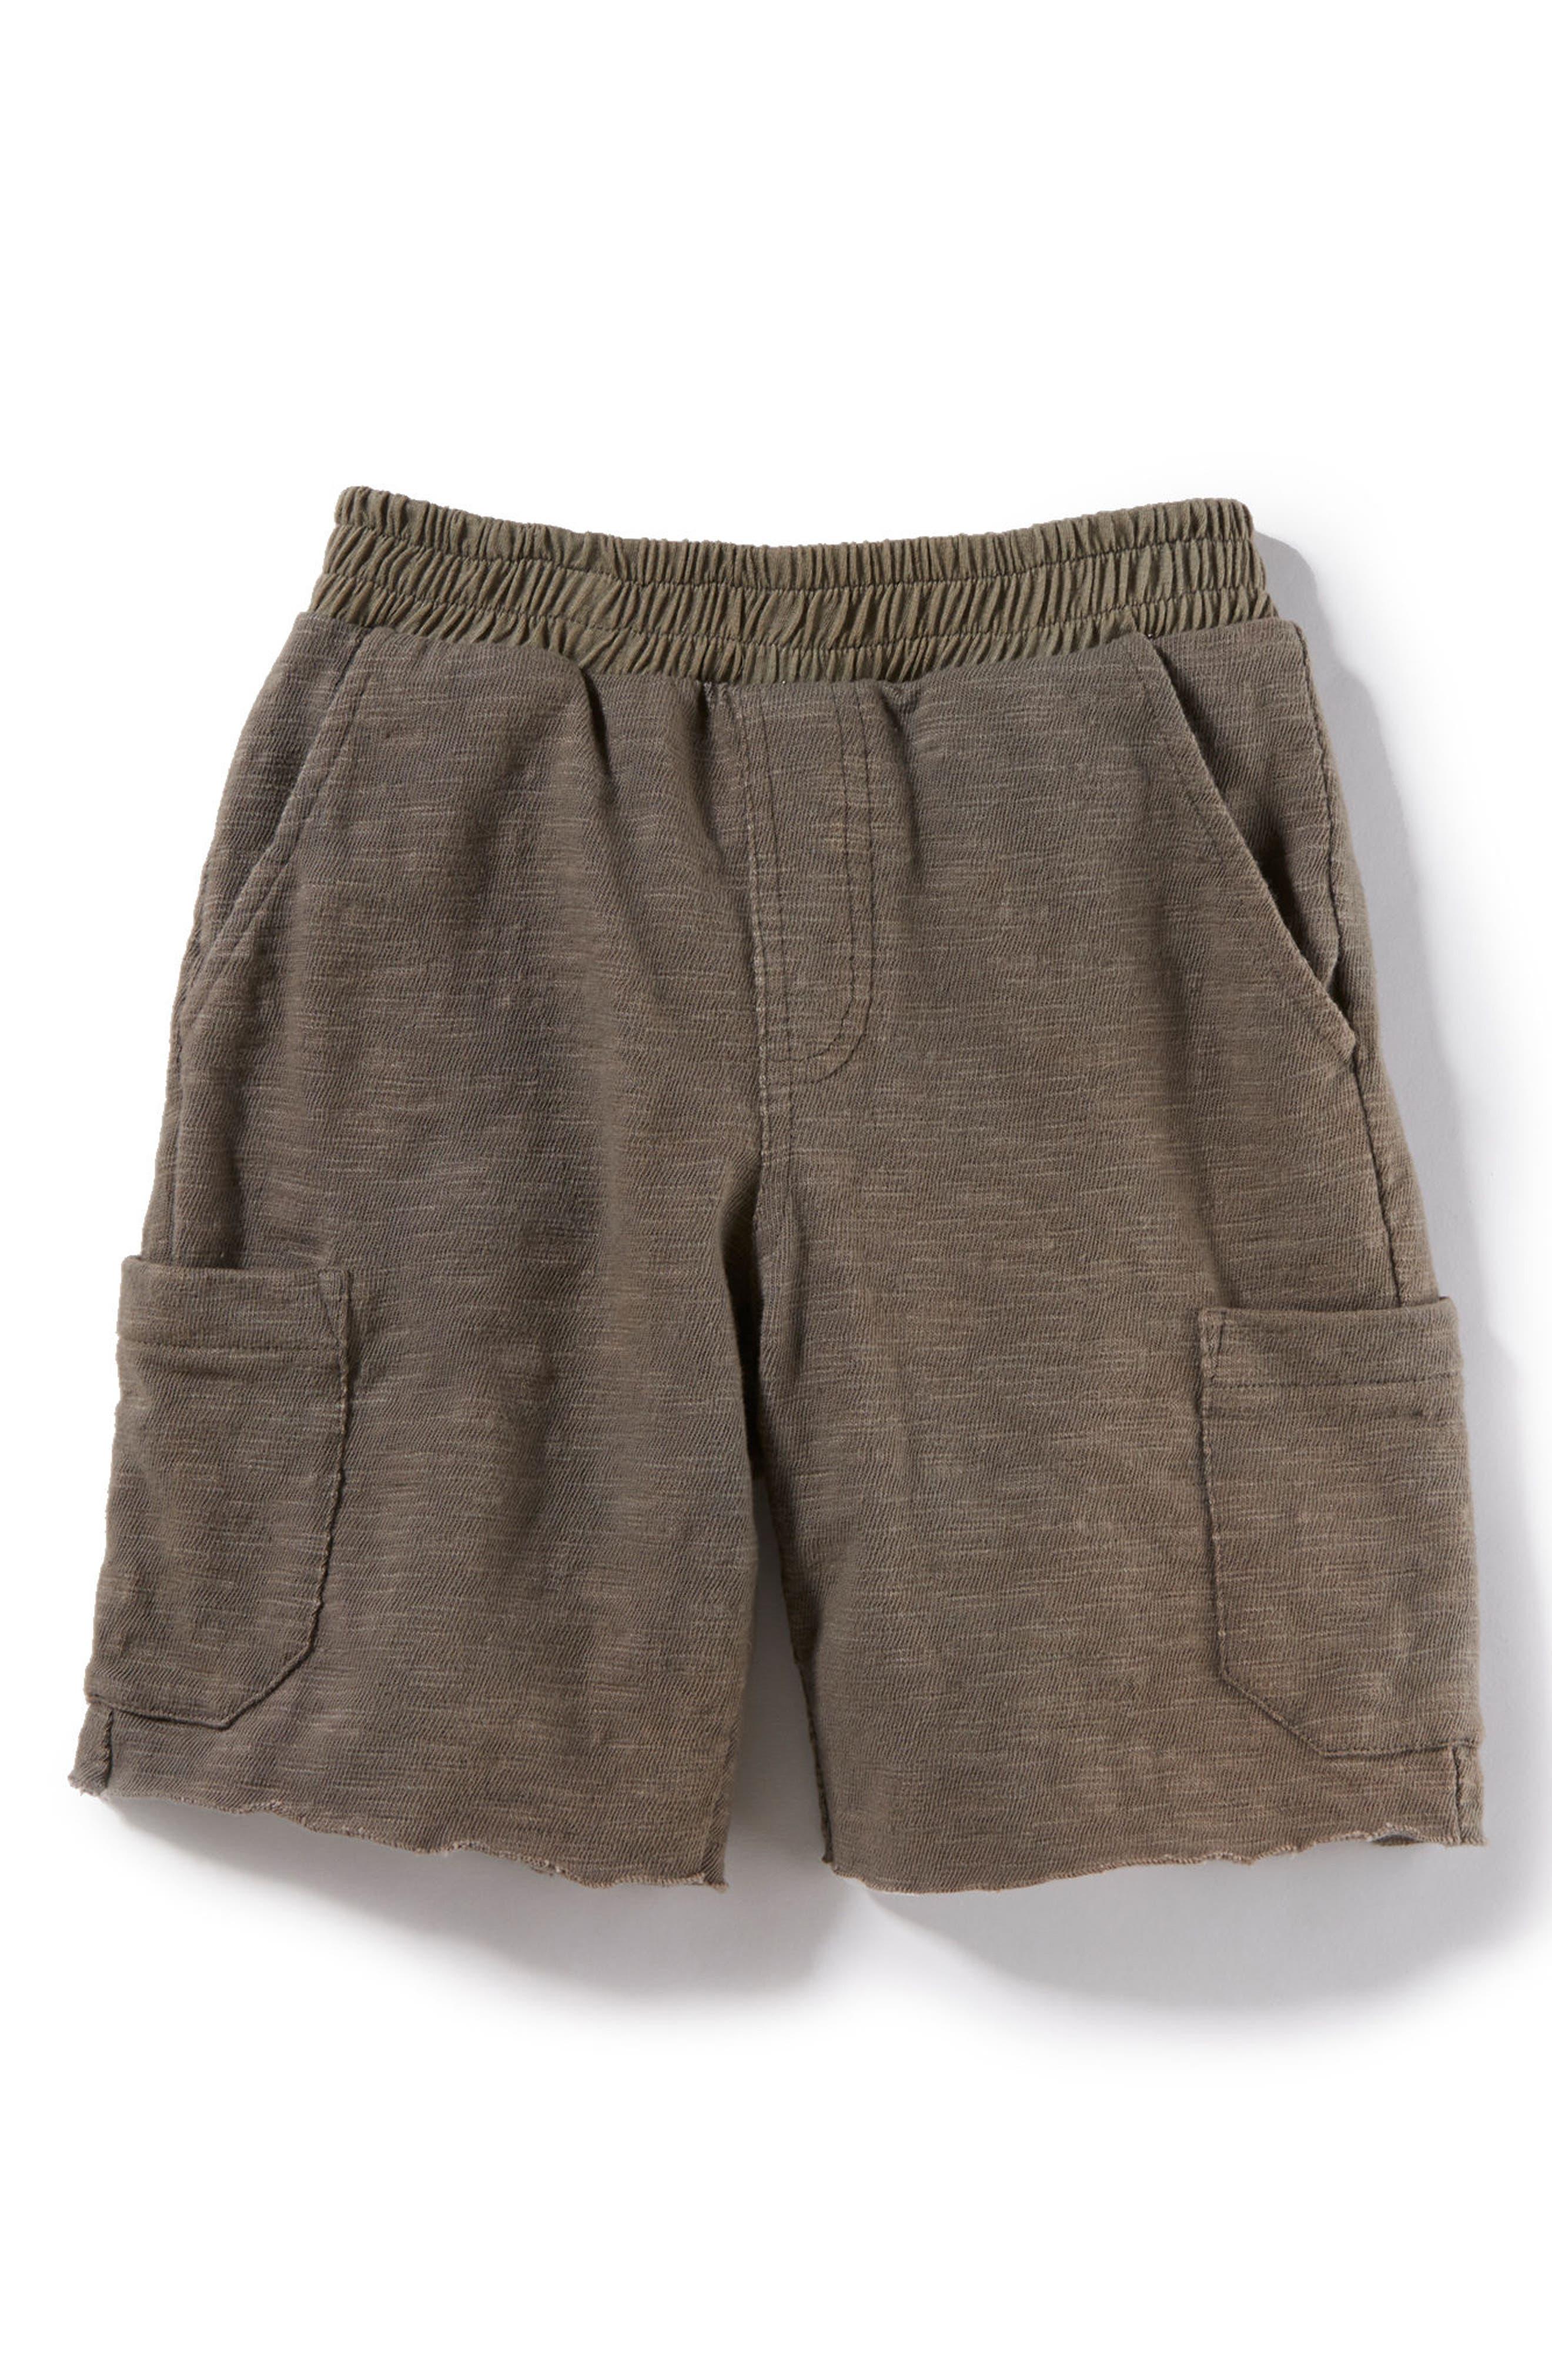 Asher Knit Shorts,                         Main,                         color, 305